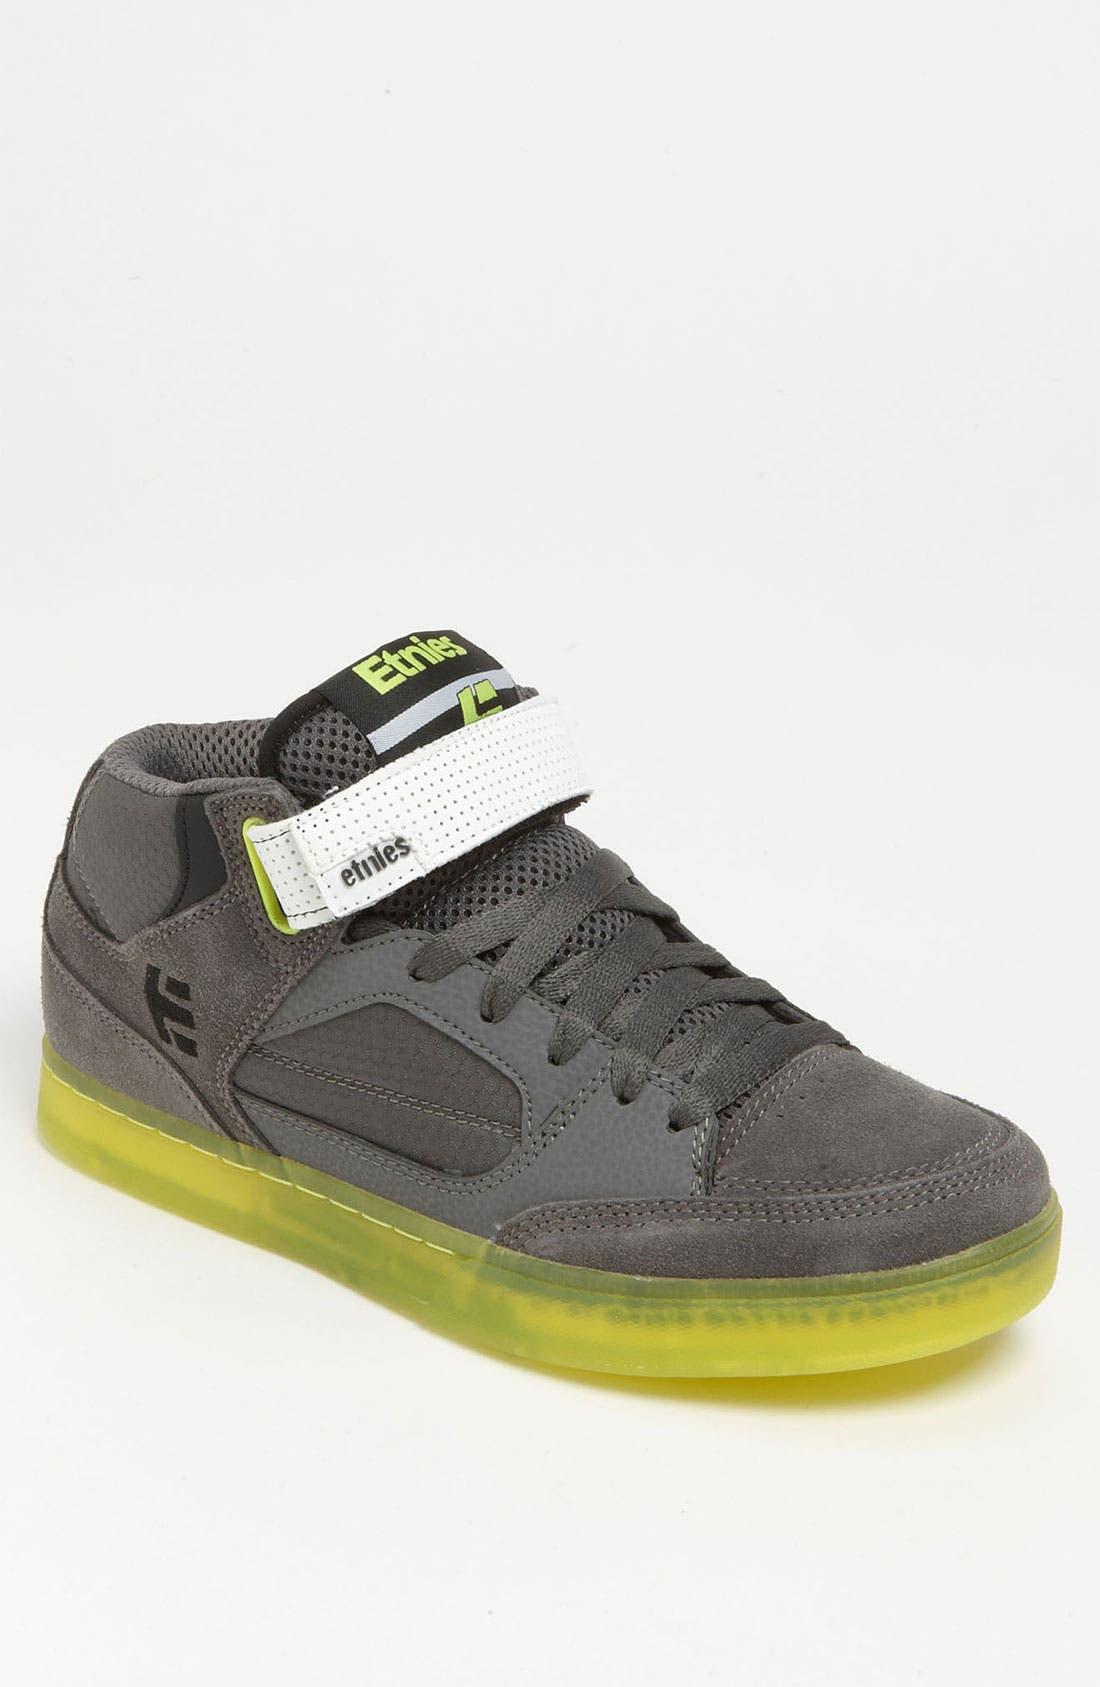 Alternate Image 1 Selected - Etnies 'Number Mid' Skate Shoe (Men)